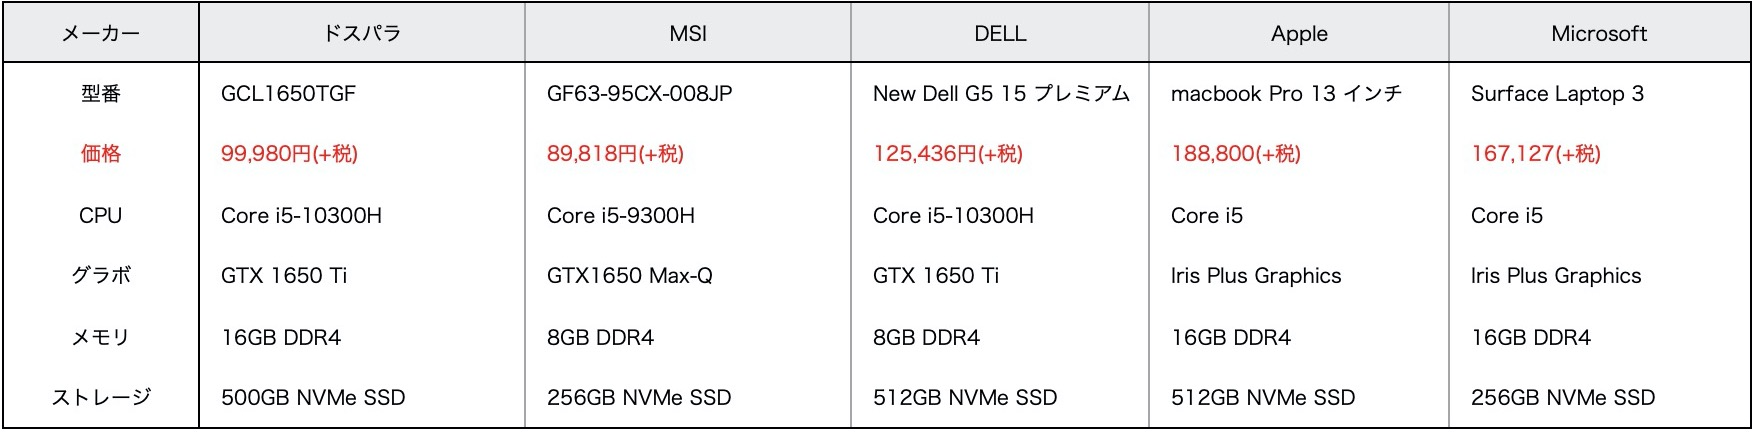 GCL1650TGF_価格比較